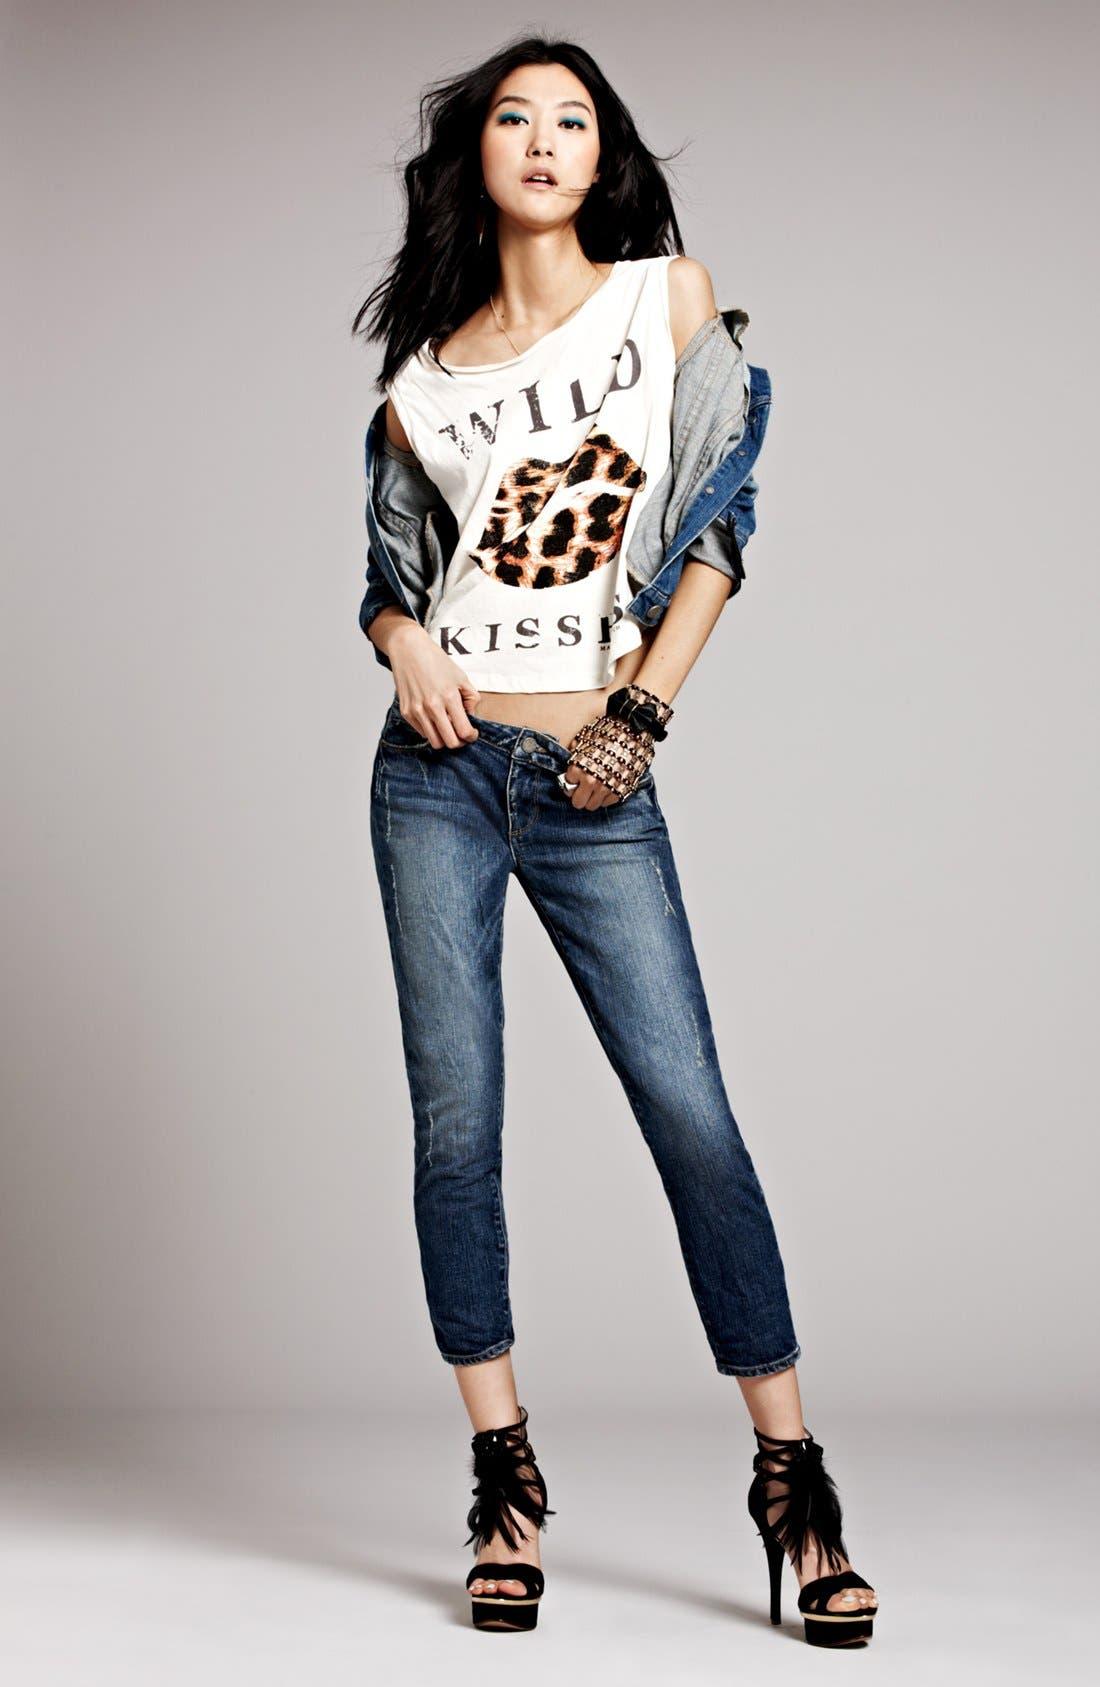 Alternate Image 1 Selected - Maison Scotch Tank, Paige Jeans & Jacket